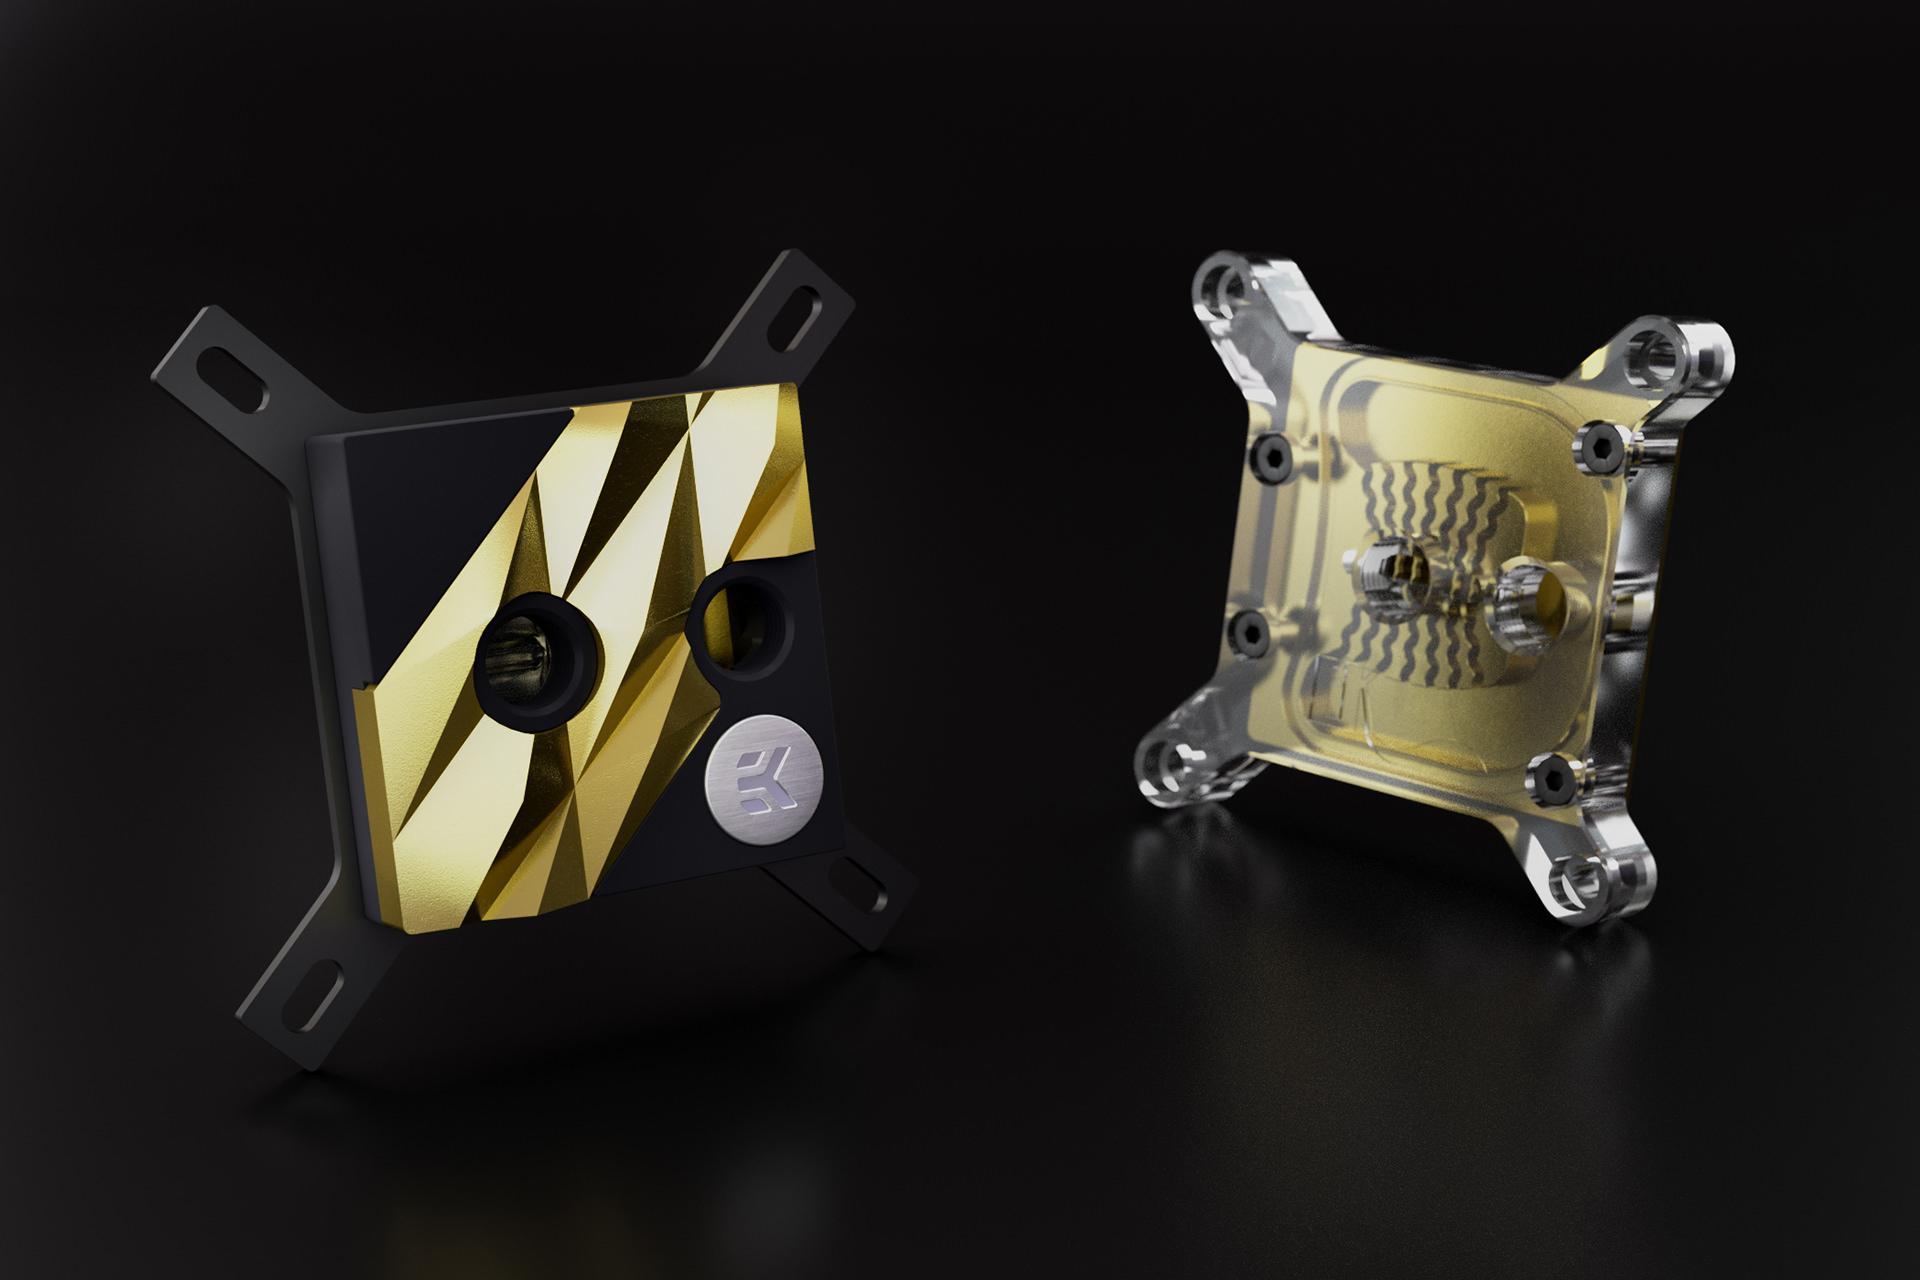 EK Releases Supremacy EVO 10th Anniversary Edition Water Block